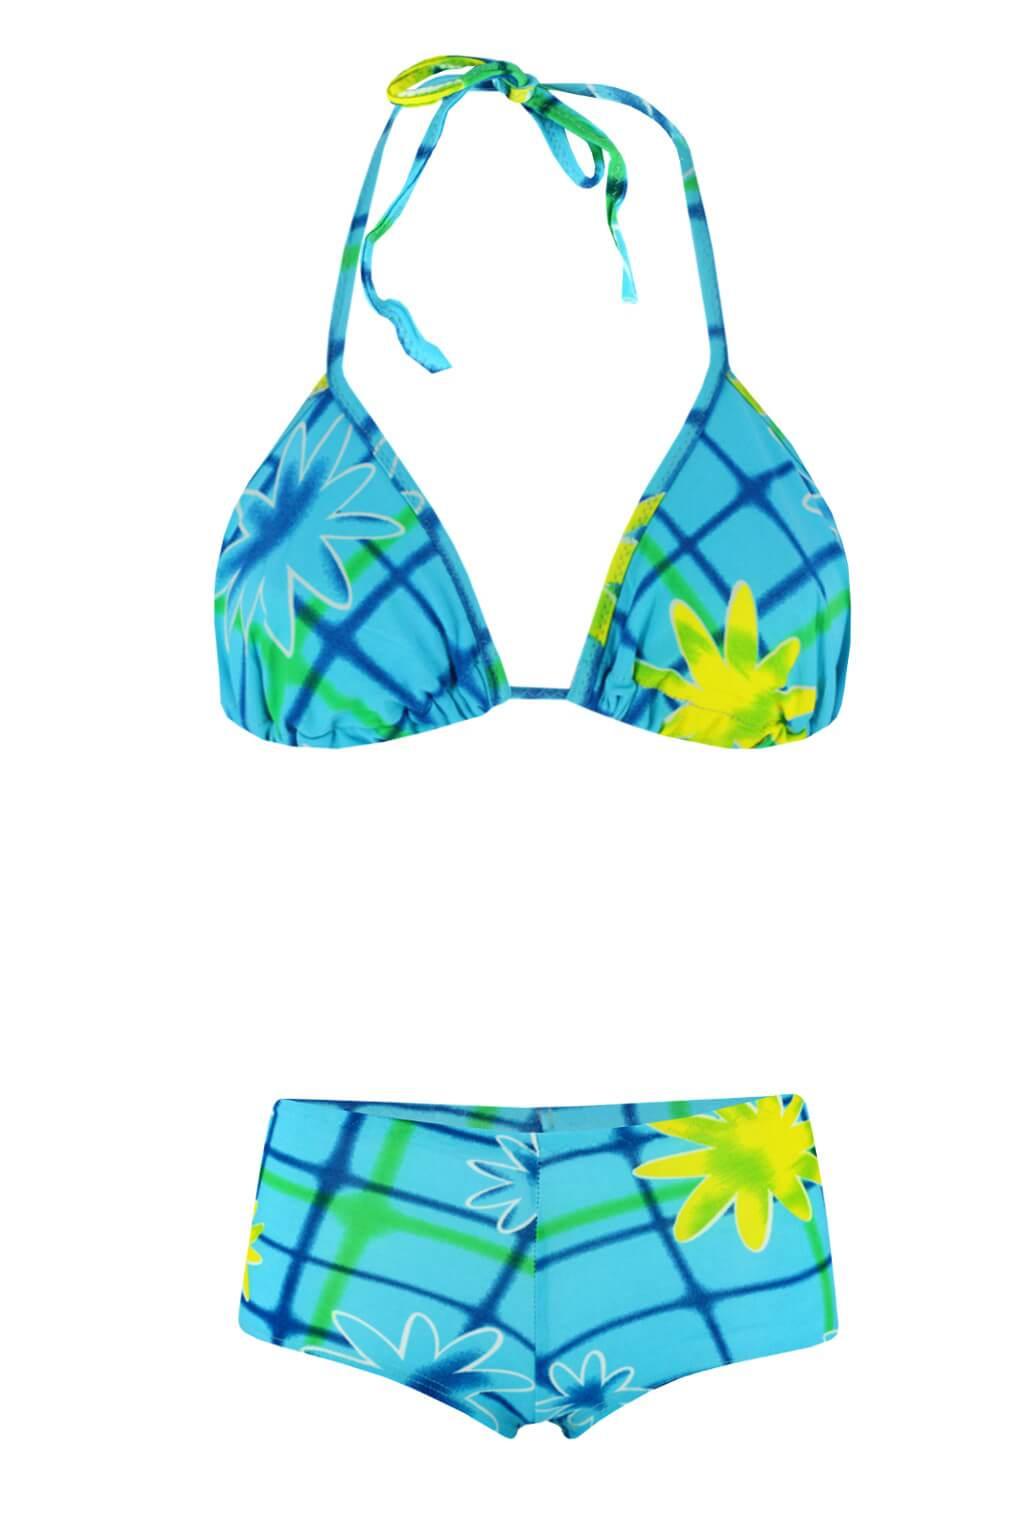 Aqua B plavky se sukénkou XS modrá